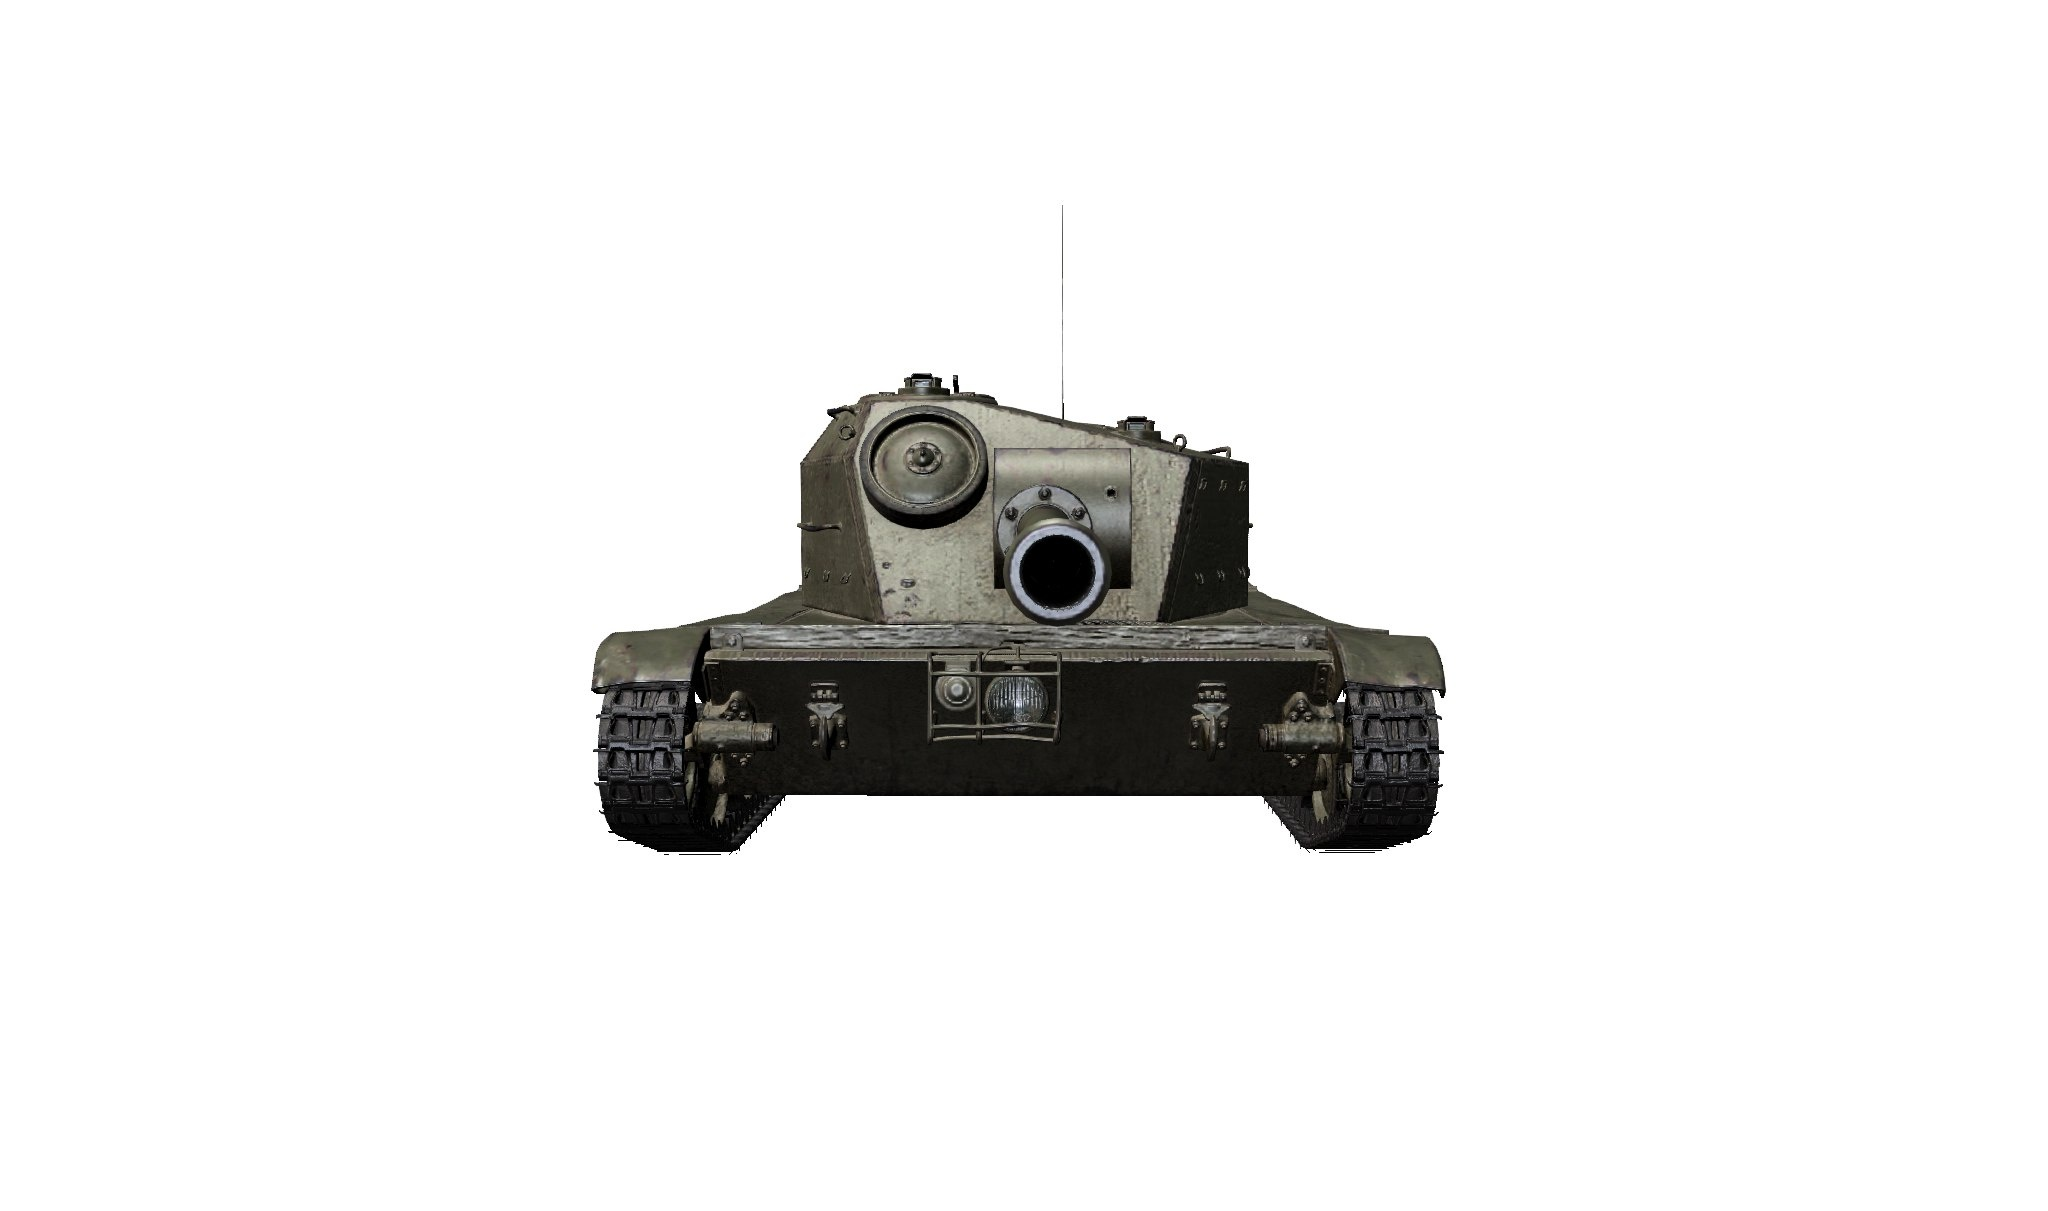 812b52f99a103 How cute (badass) is the Luchs tank  - Quora